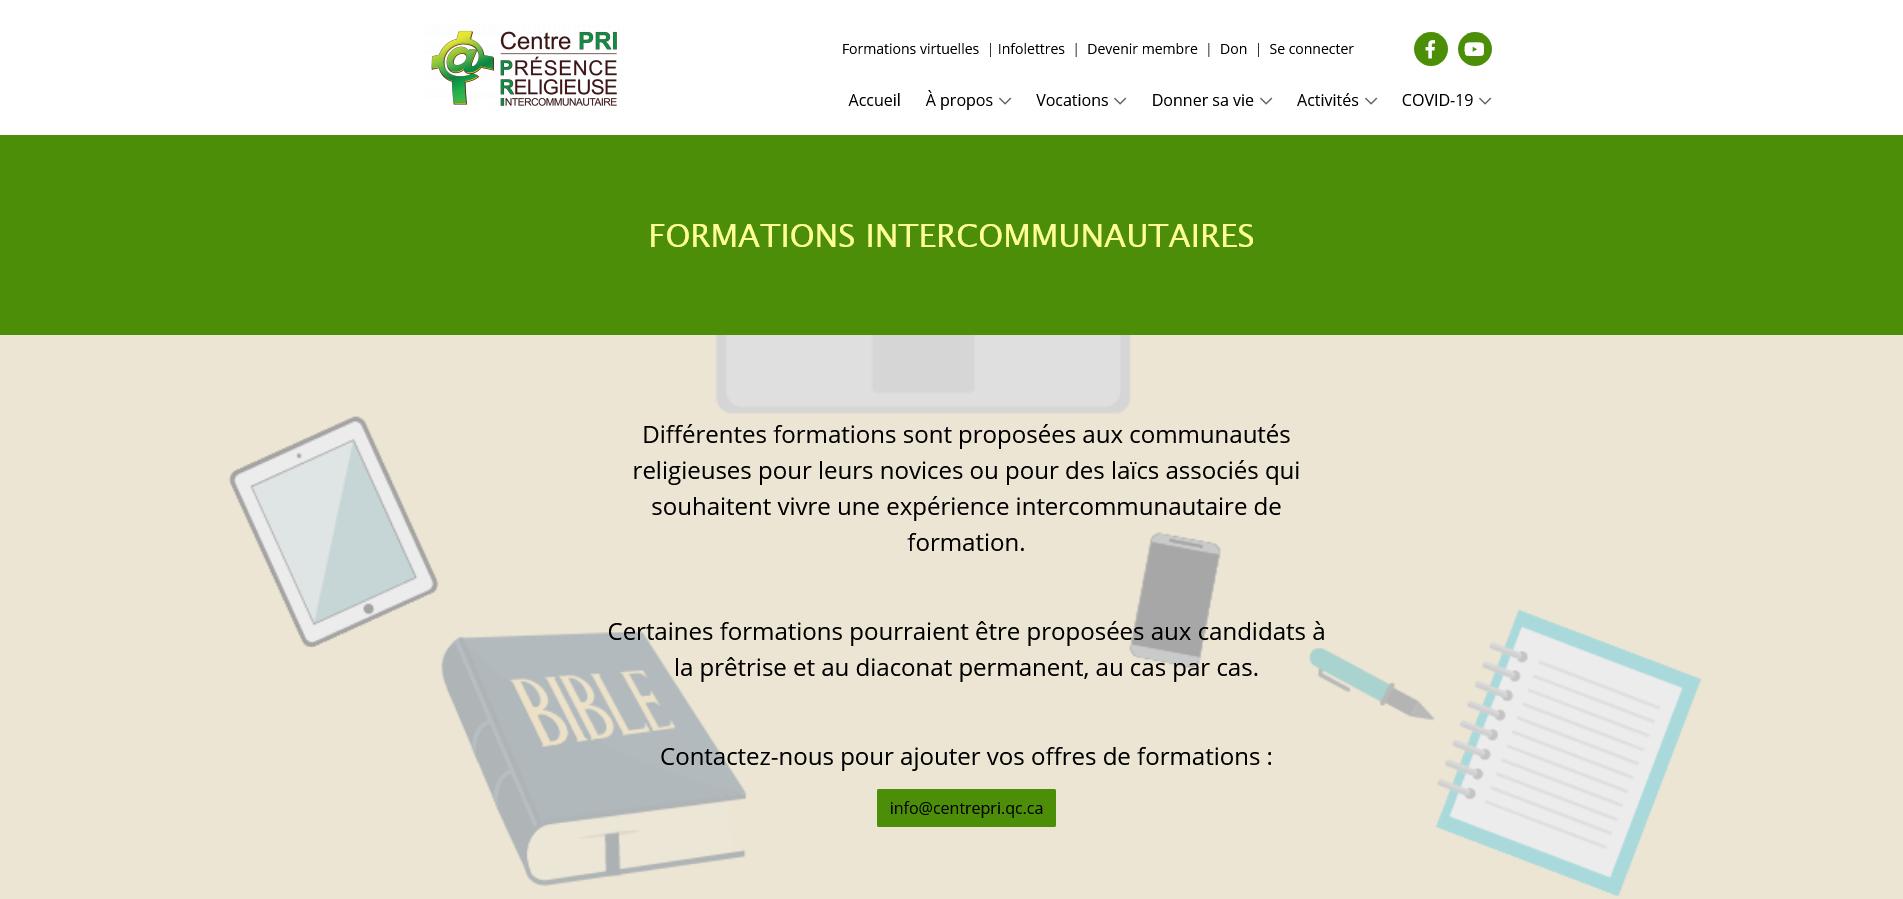 Formations intercommunautaires